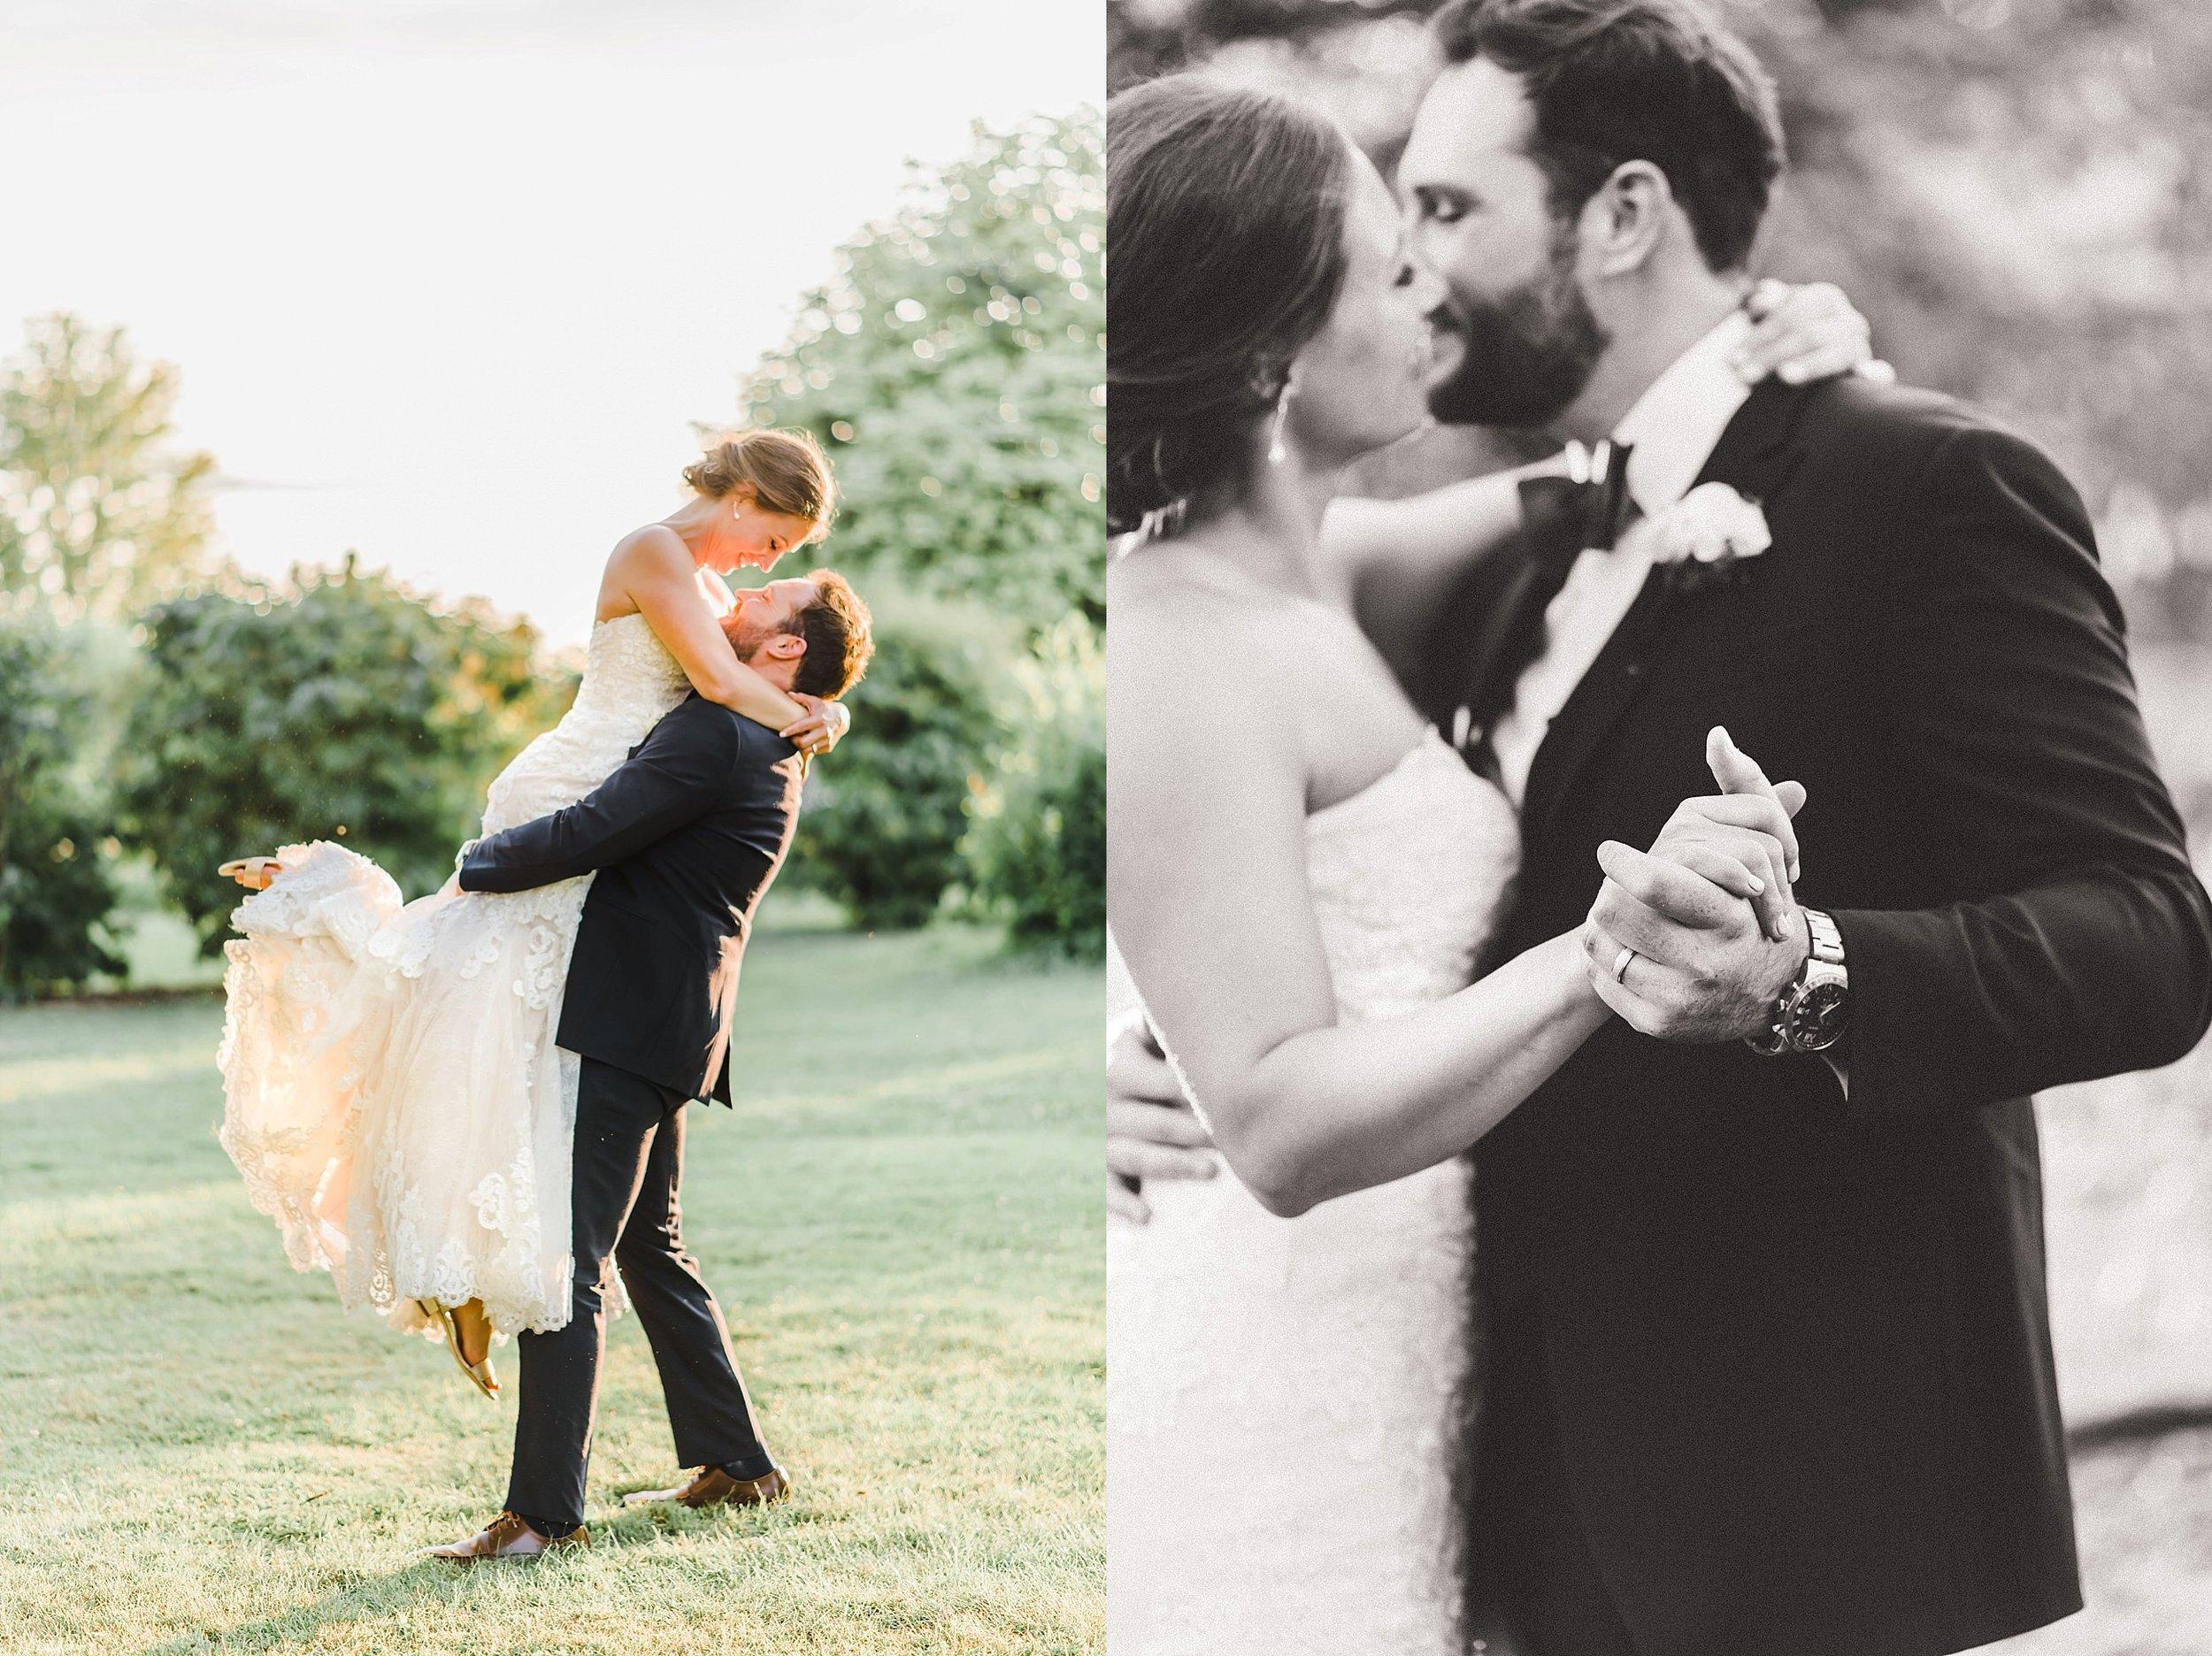 light airy indie fine art ottawa wedding photographer   Ali and Batoul Photography_1060.jpg